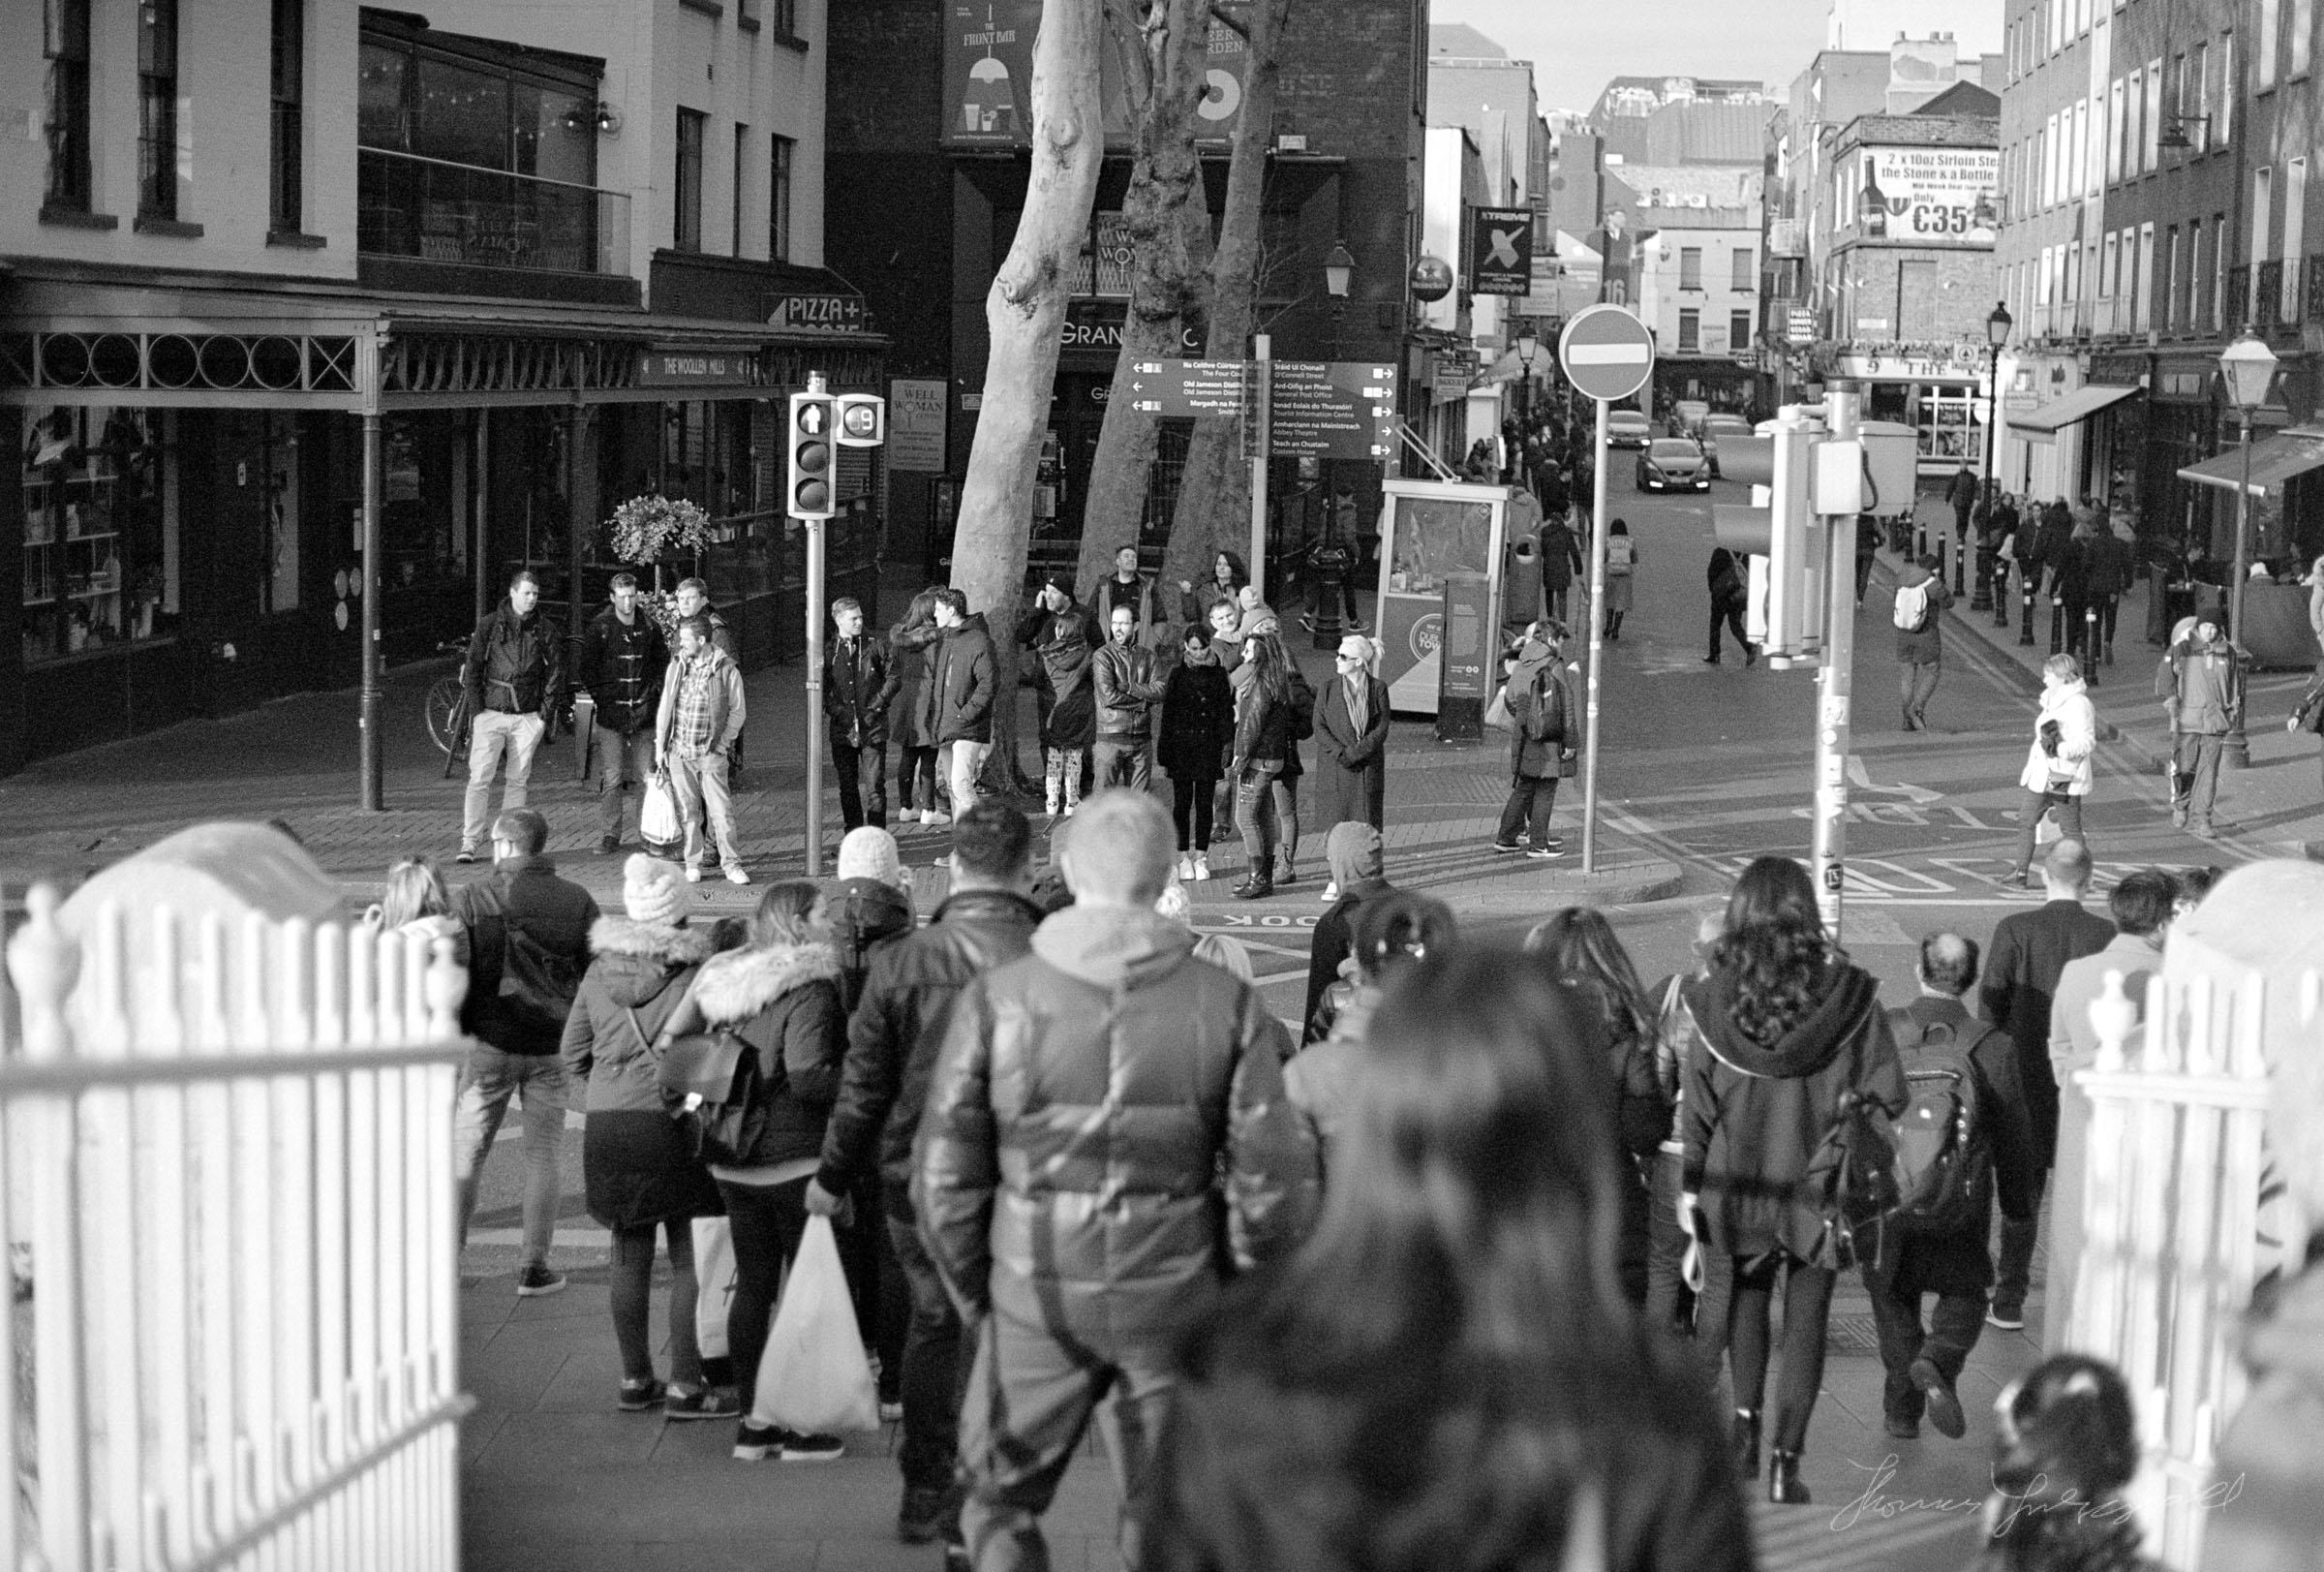 Crossing the road at the Ha'Penny Bridge - Dublin on Film - The Streets of Dublin